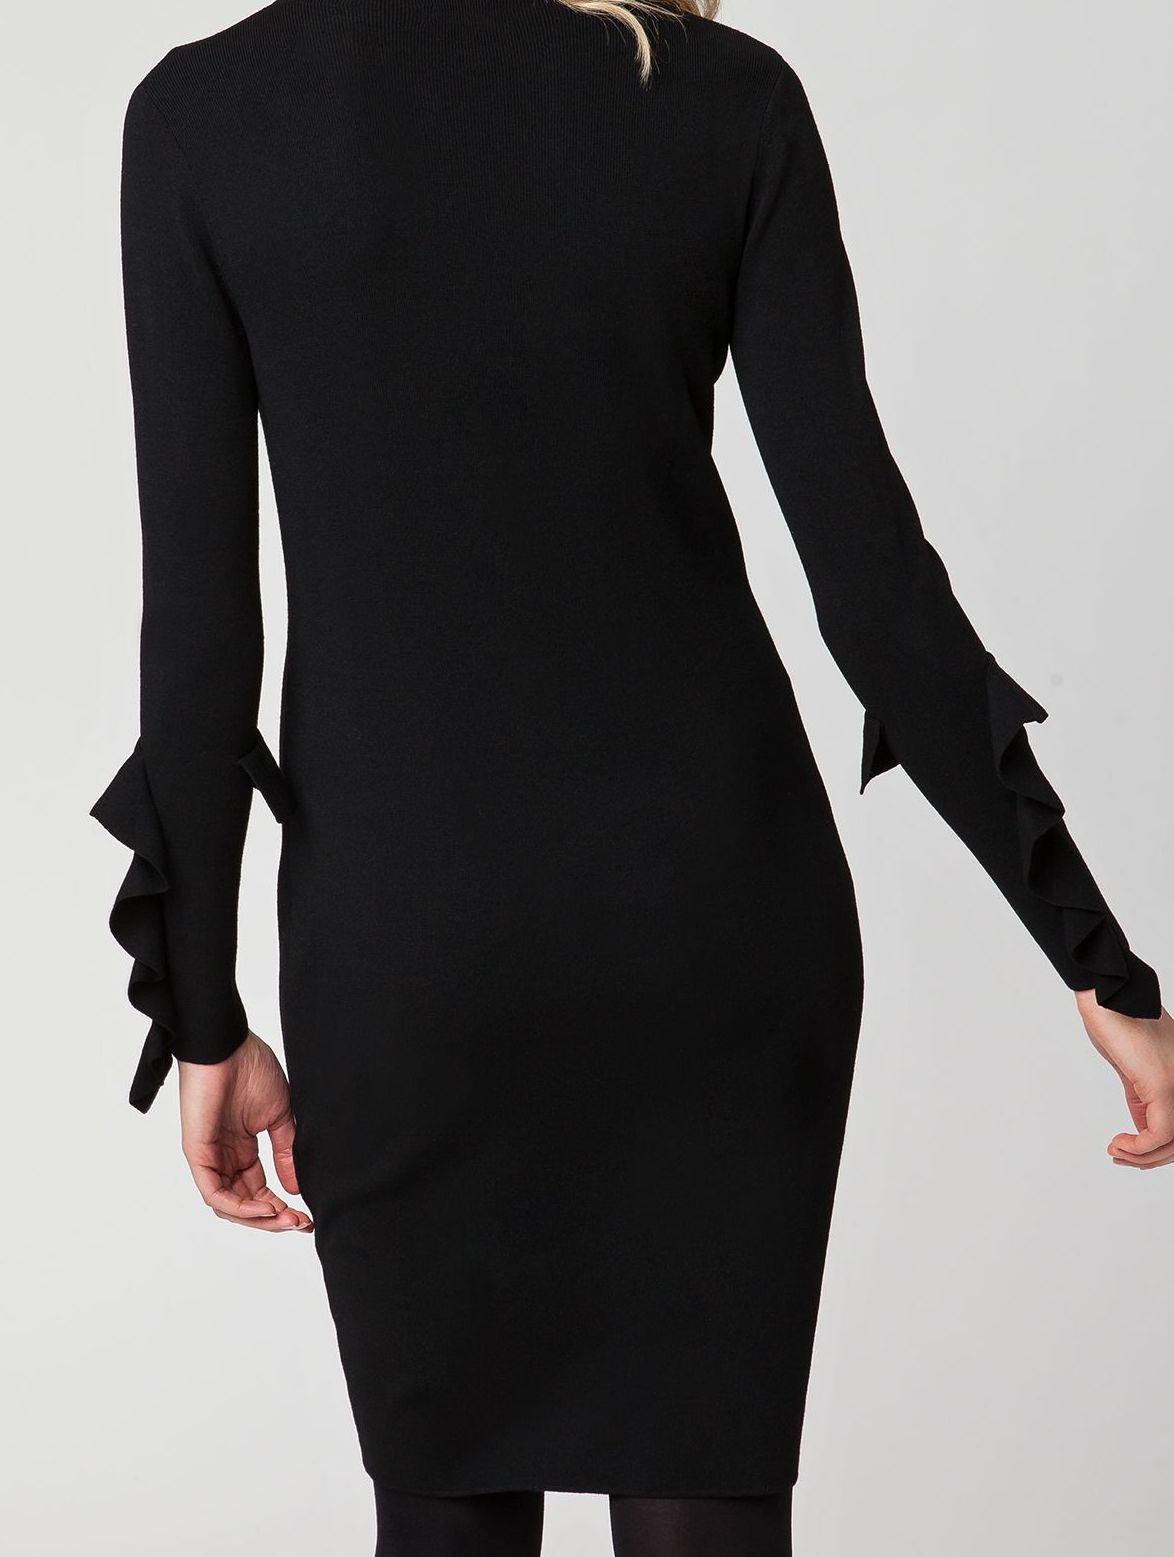 36f4f8ad Sukienka Solar r. 36 nowa kolekcja jesień 2018 - 7625611087 ...